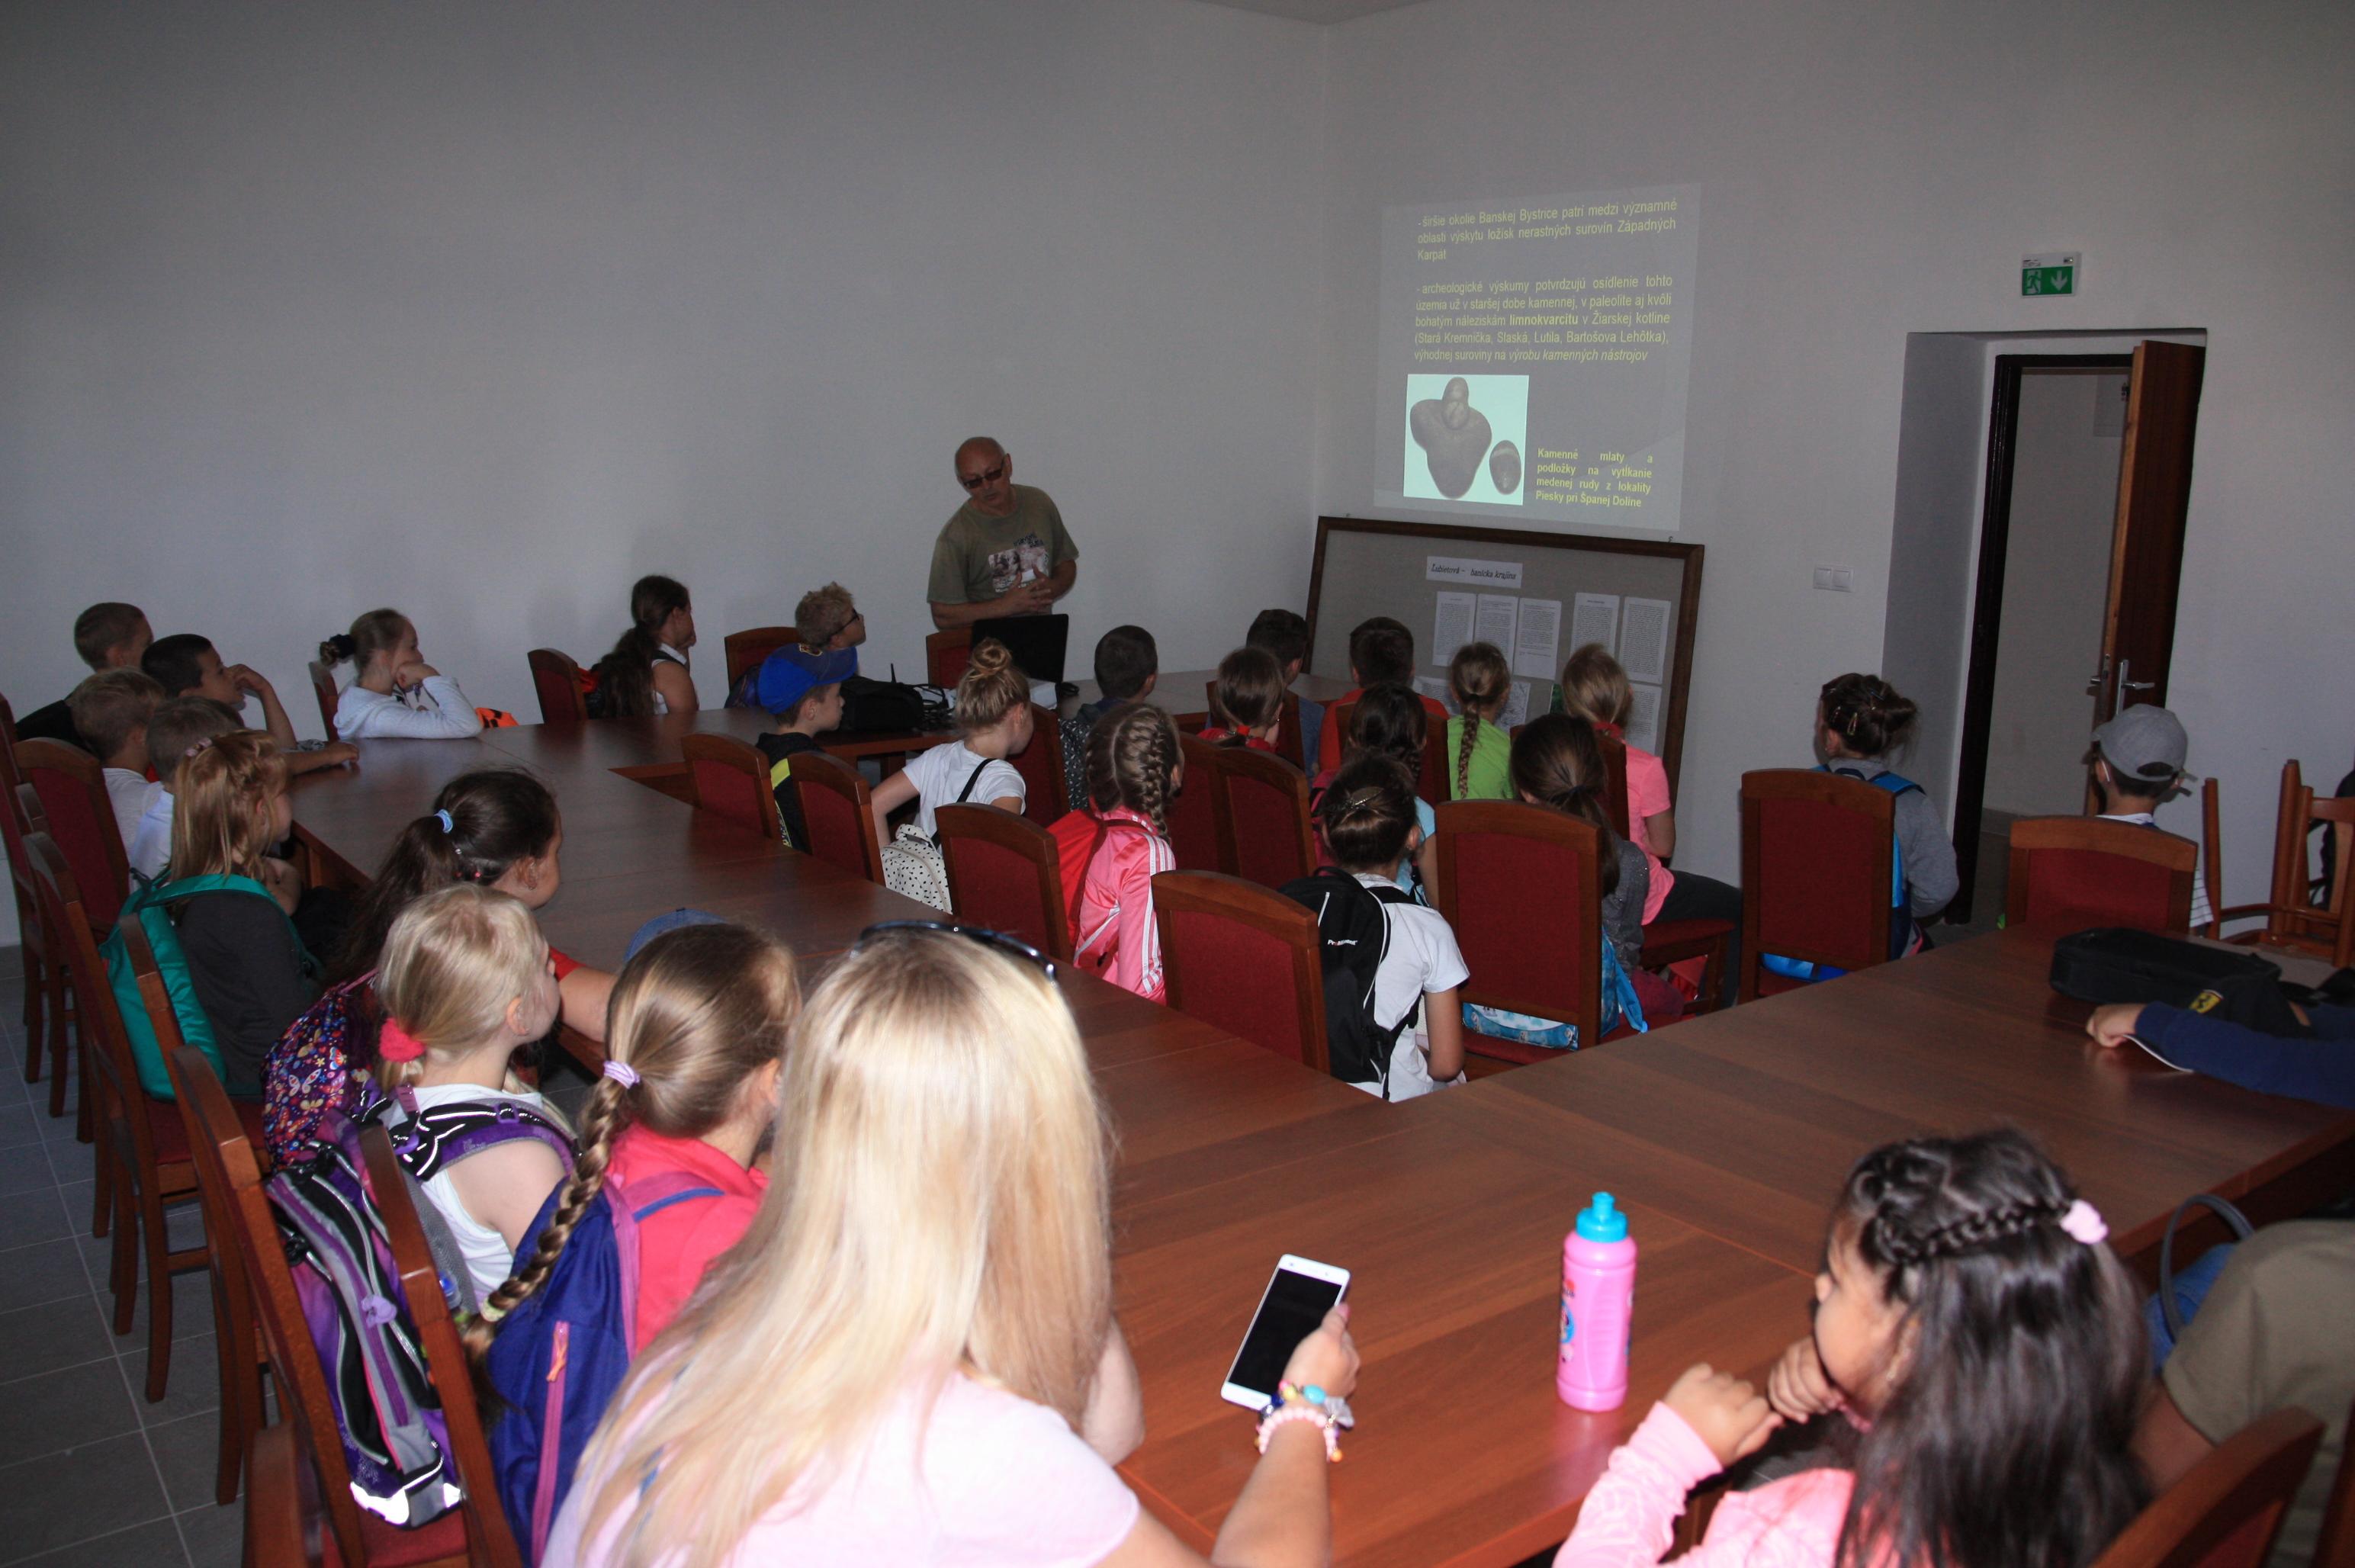 89706c59c Week of European Geoparks - Geoparks in Slovakia